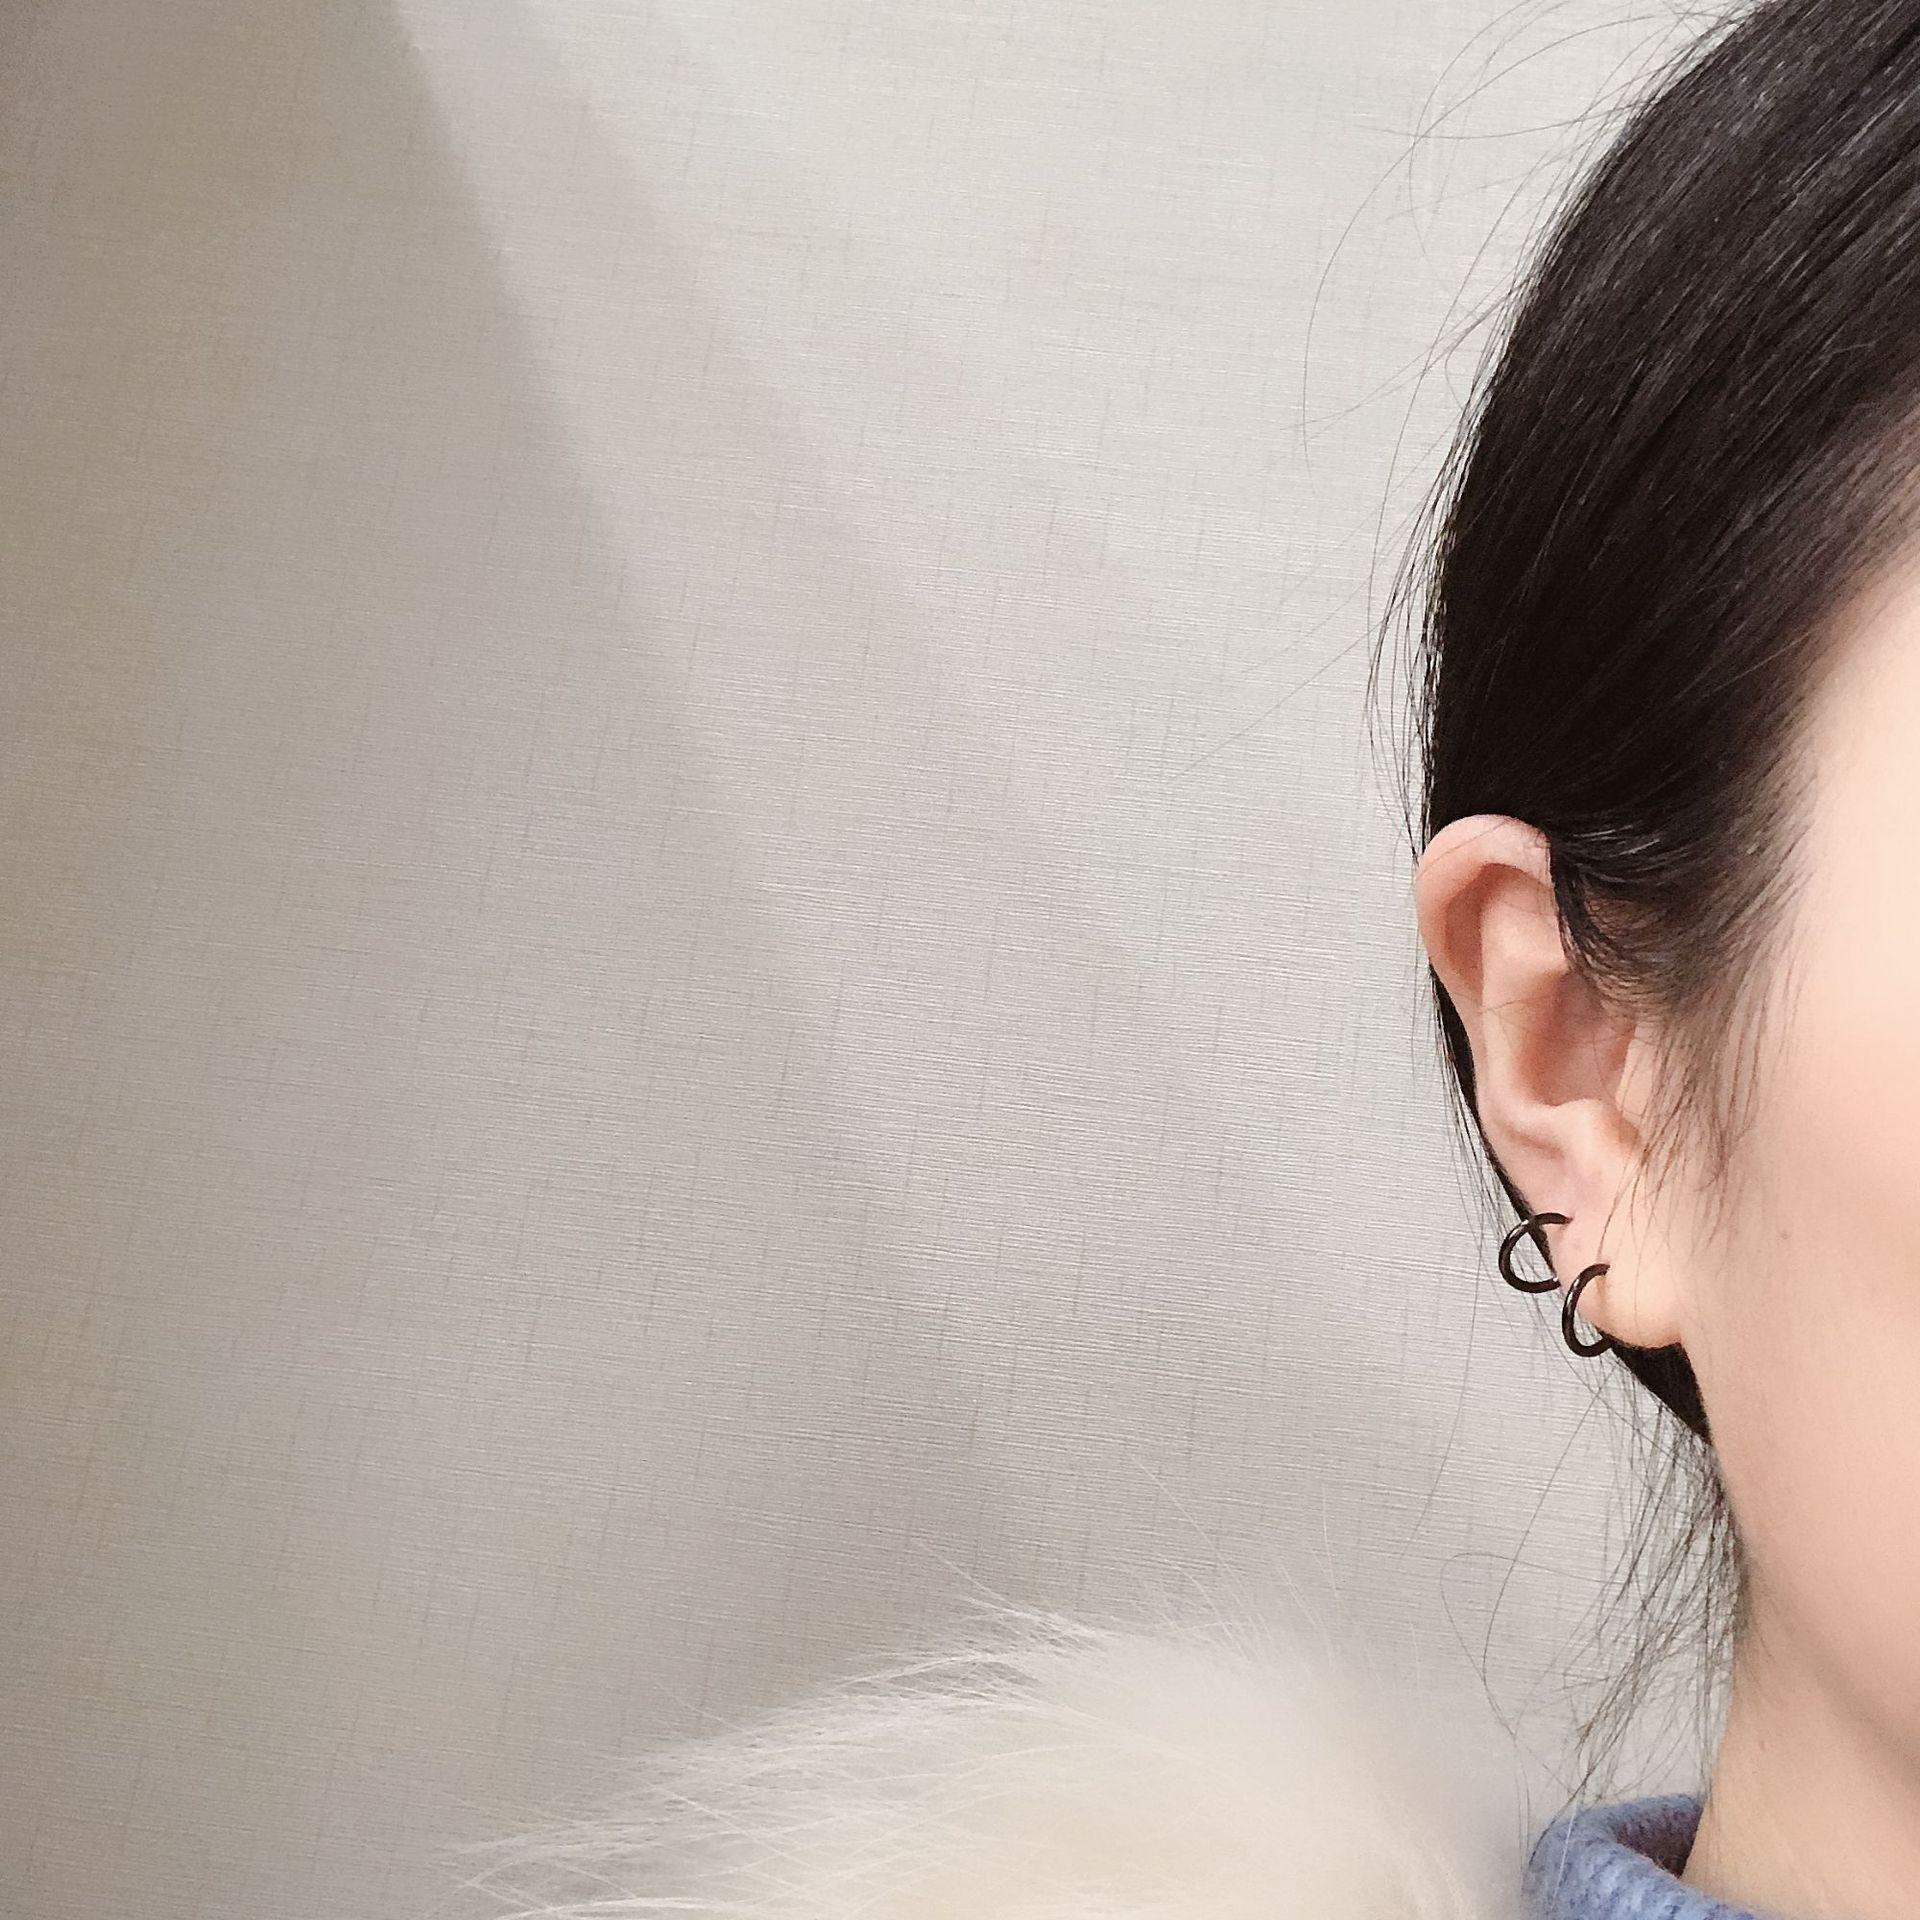 S925 Sterling Silver New minimalist basic plain Earrings punk style versatile earrings earrings for men and women